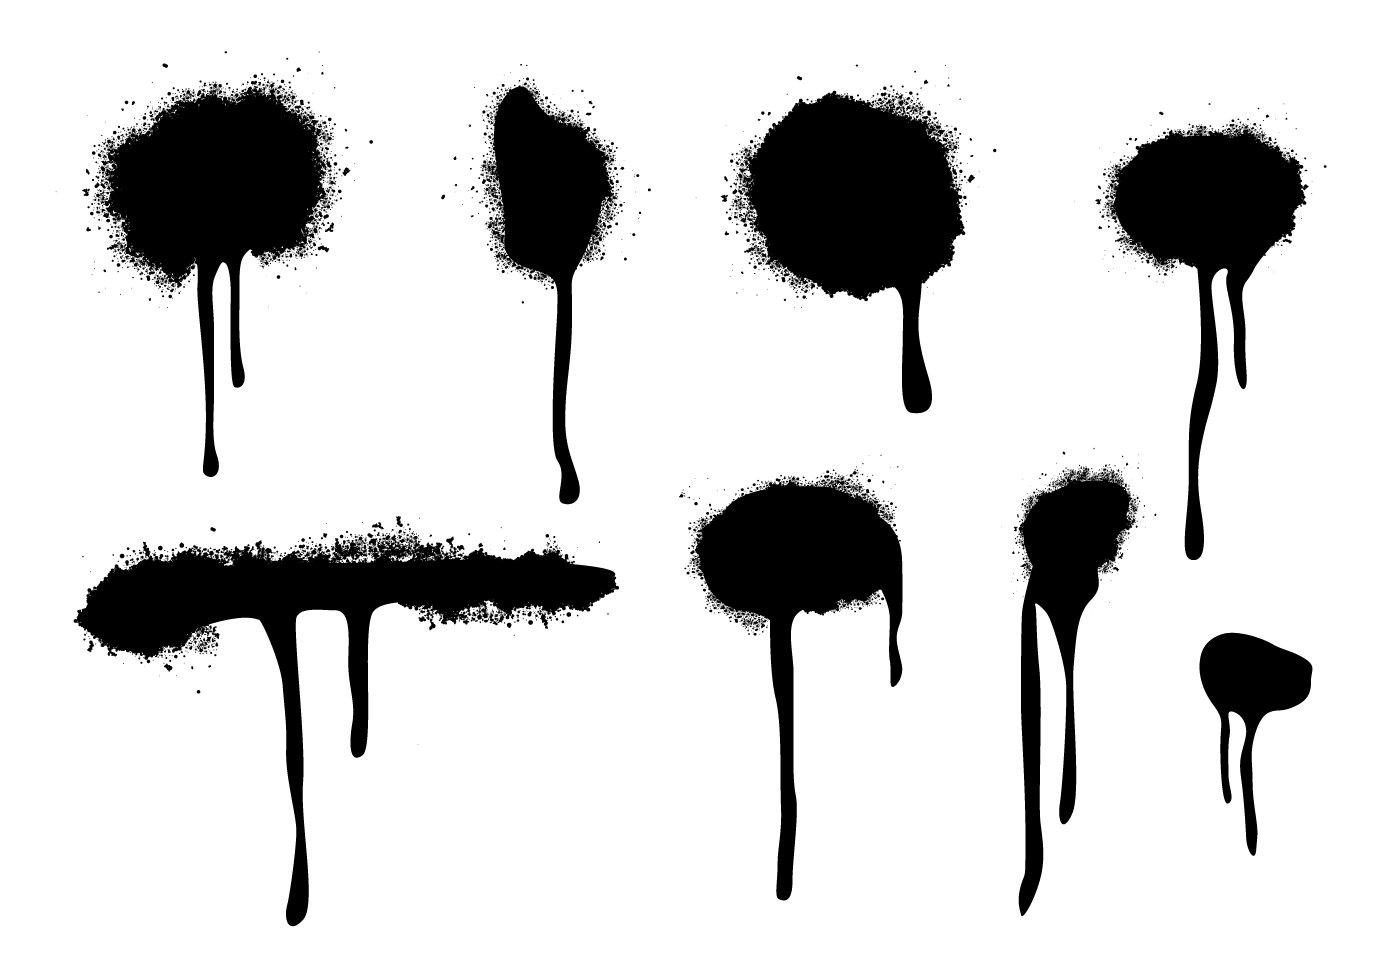 Graffiti Cap Spray Paint Brushes Photoshop